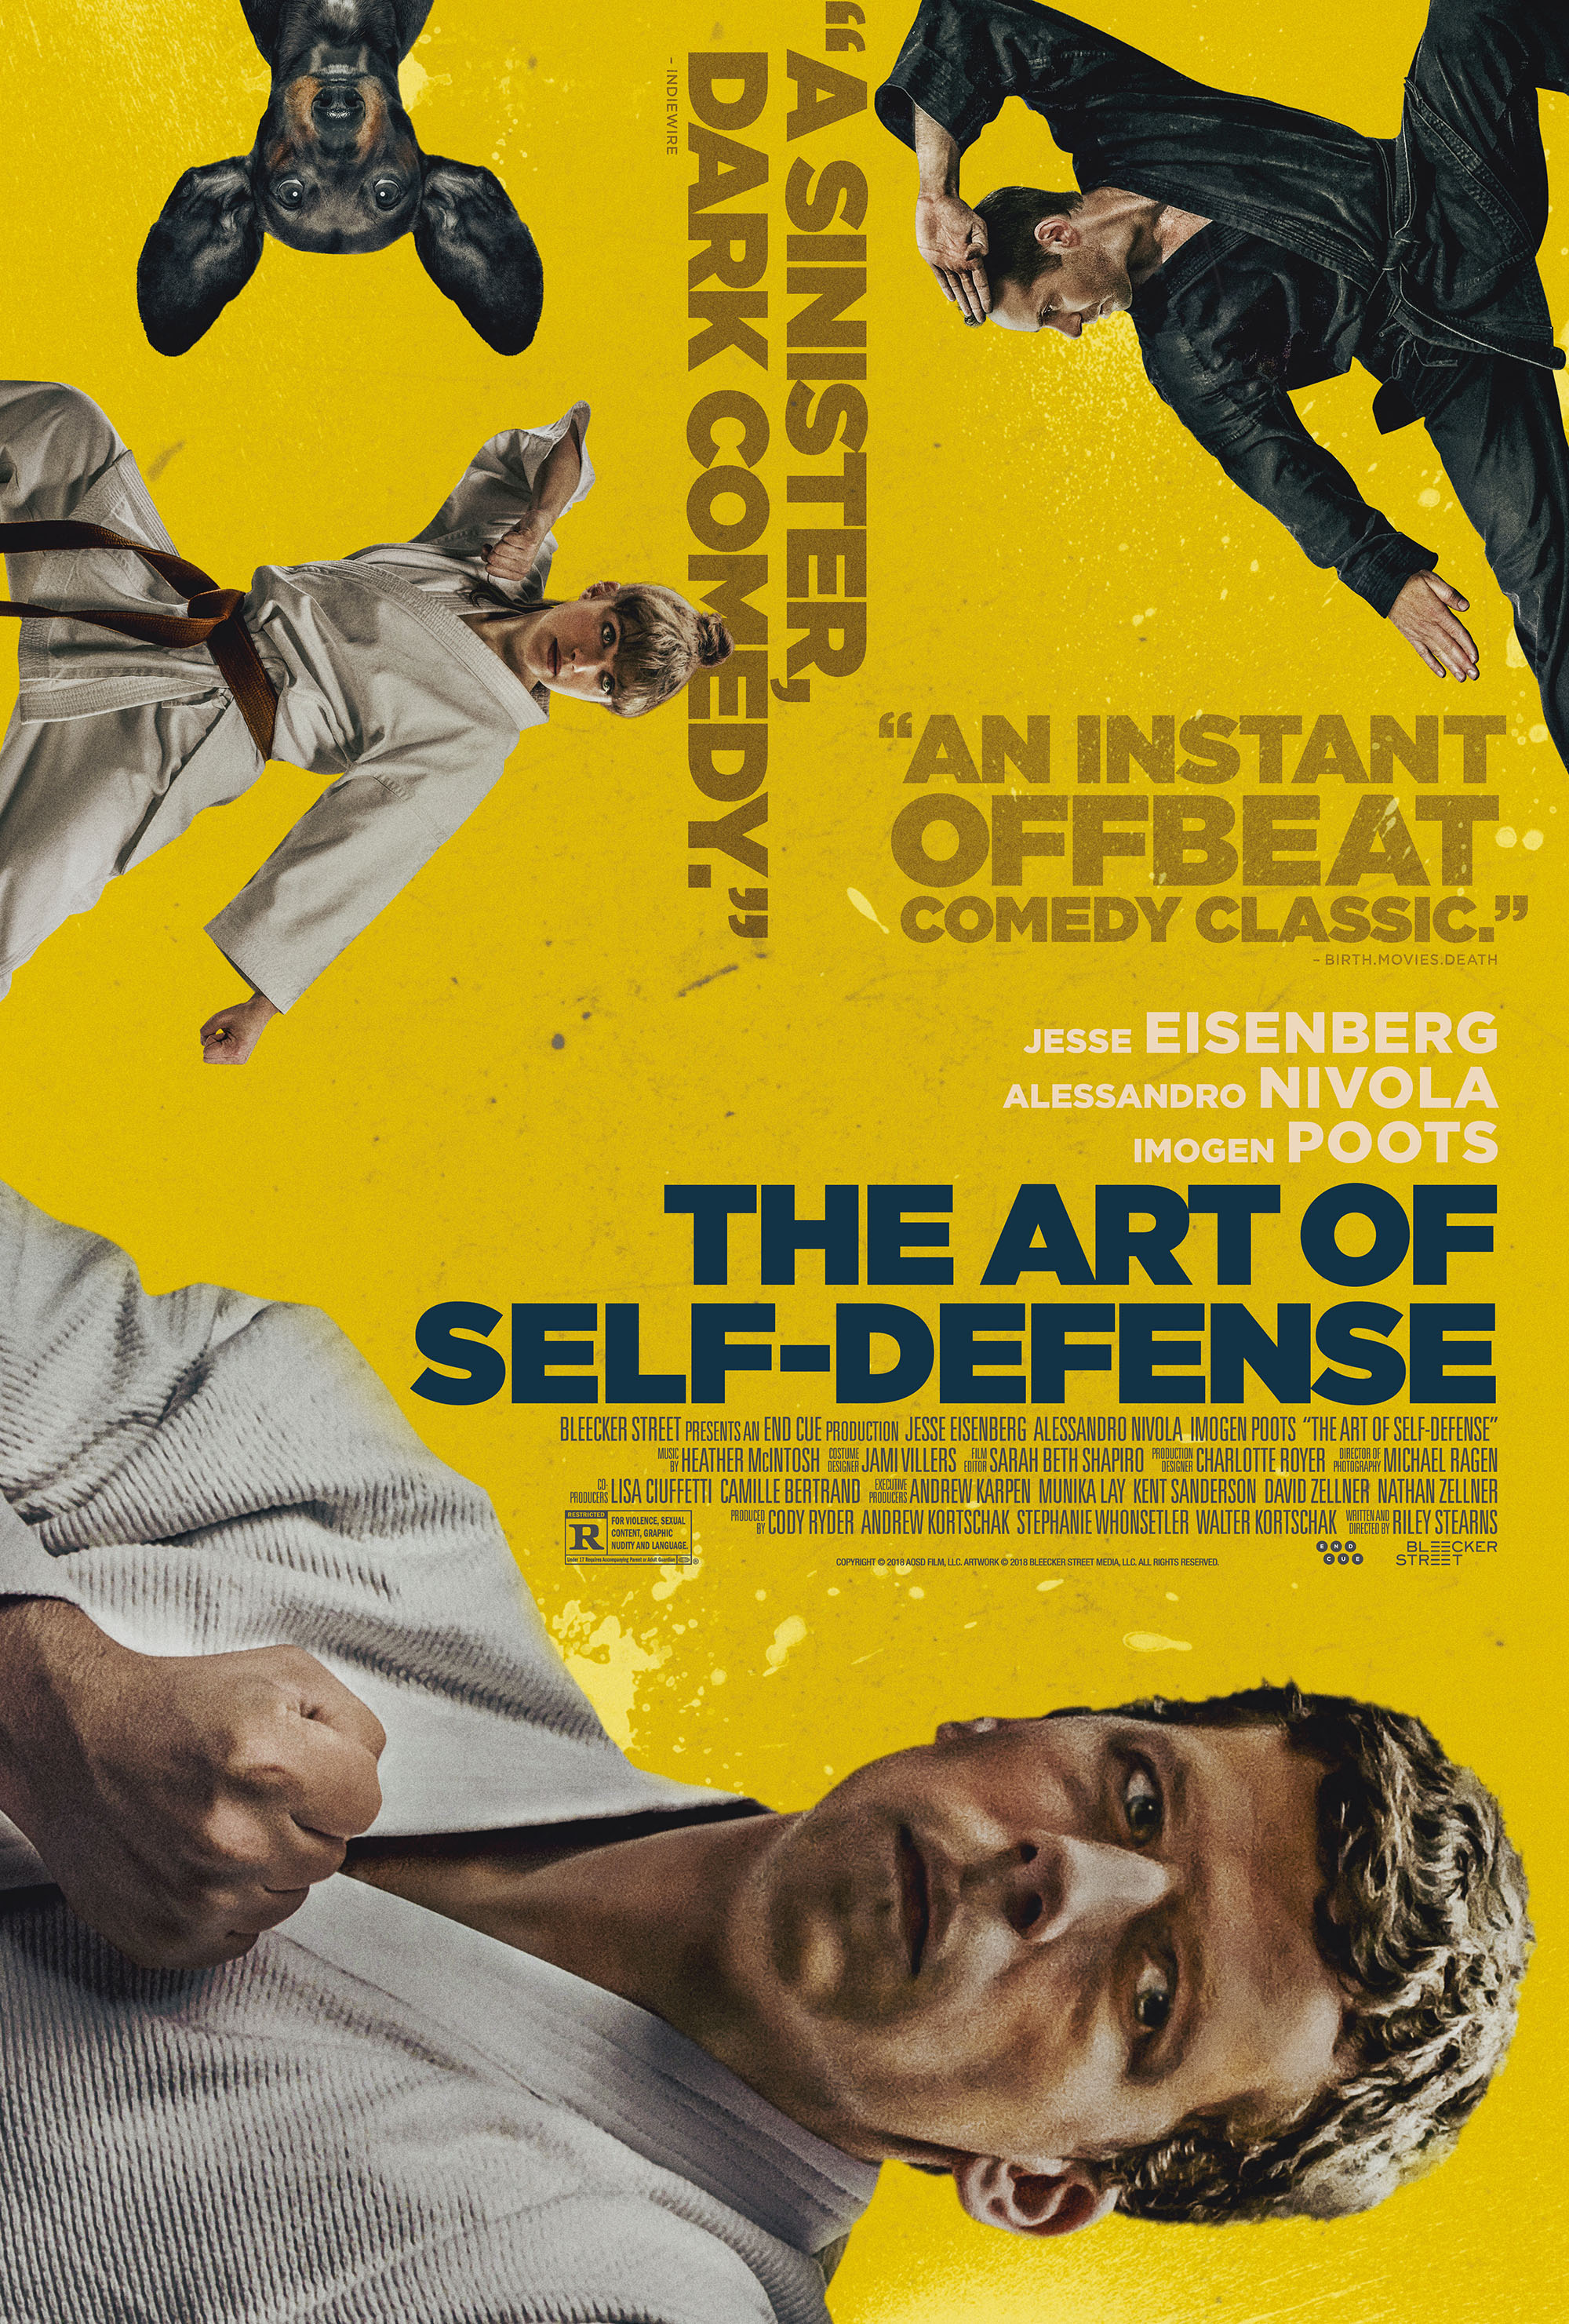 The_Art_of_Self_Defense_KeyartVert_69F-1.jpg